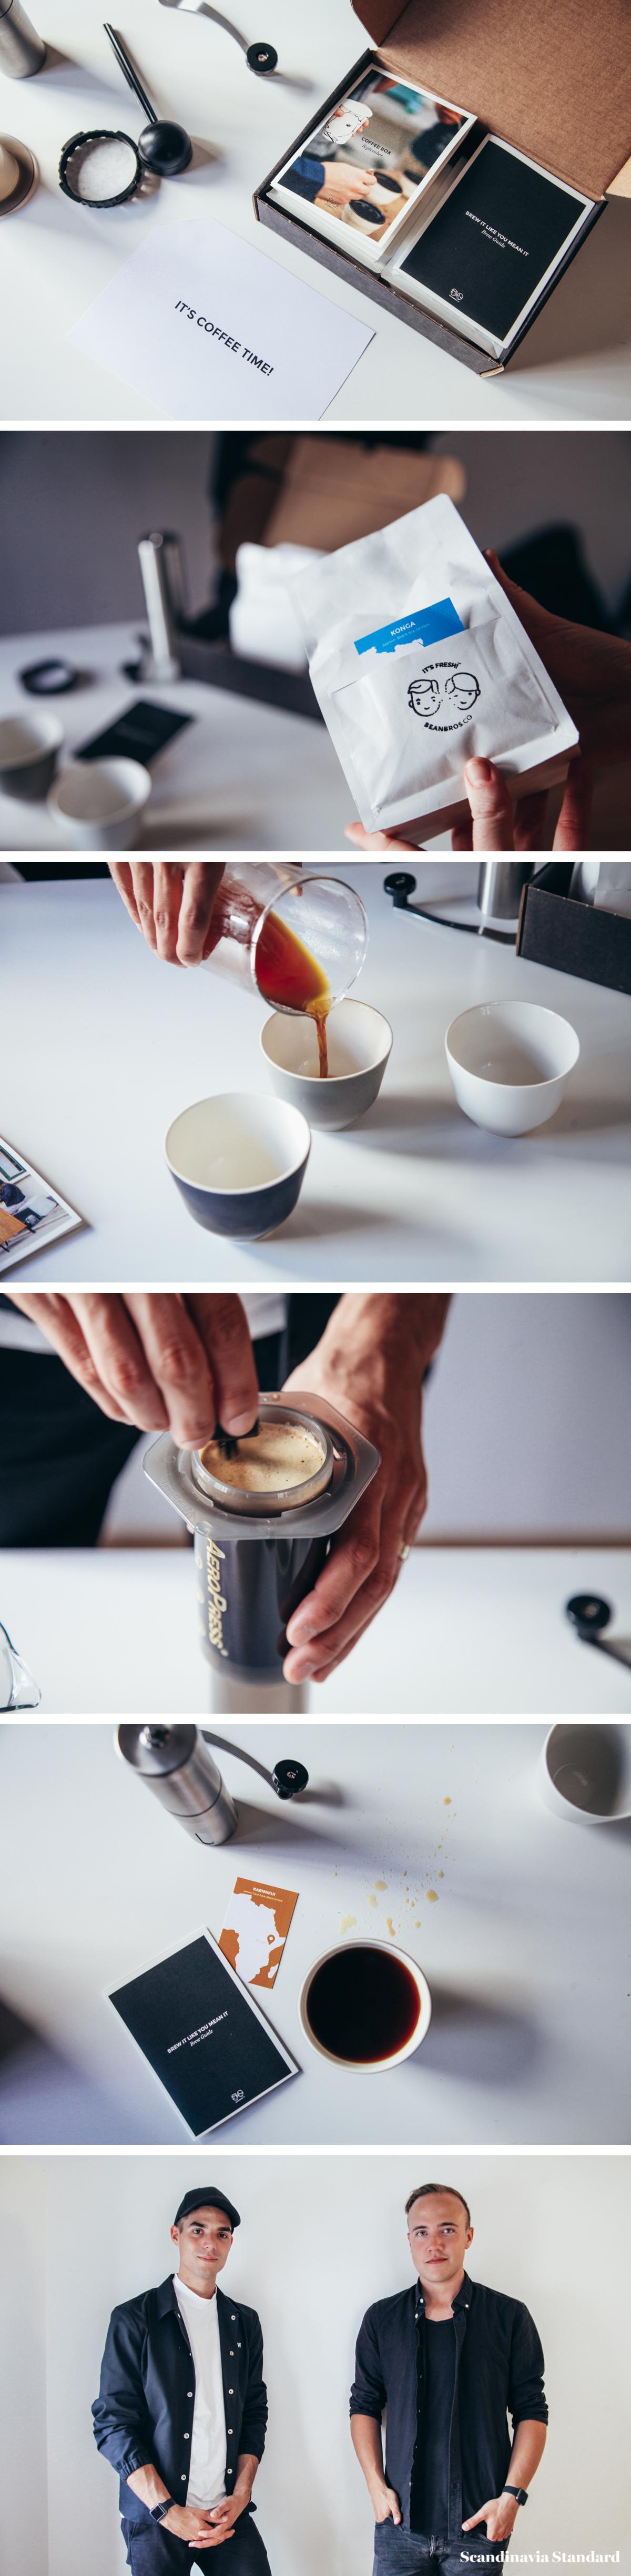 bean-brother-collage-2-scandinavia-standard